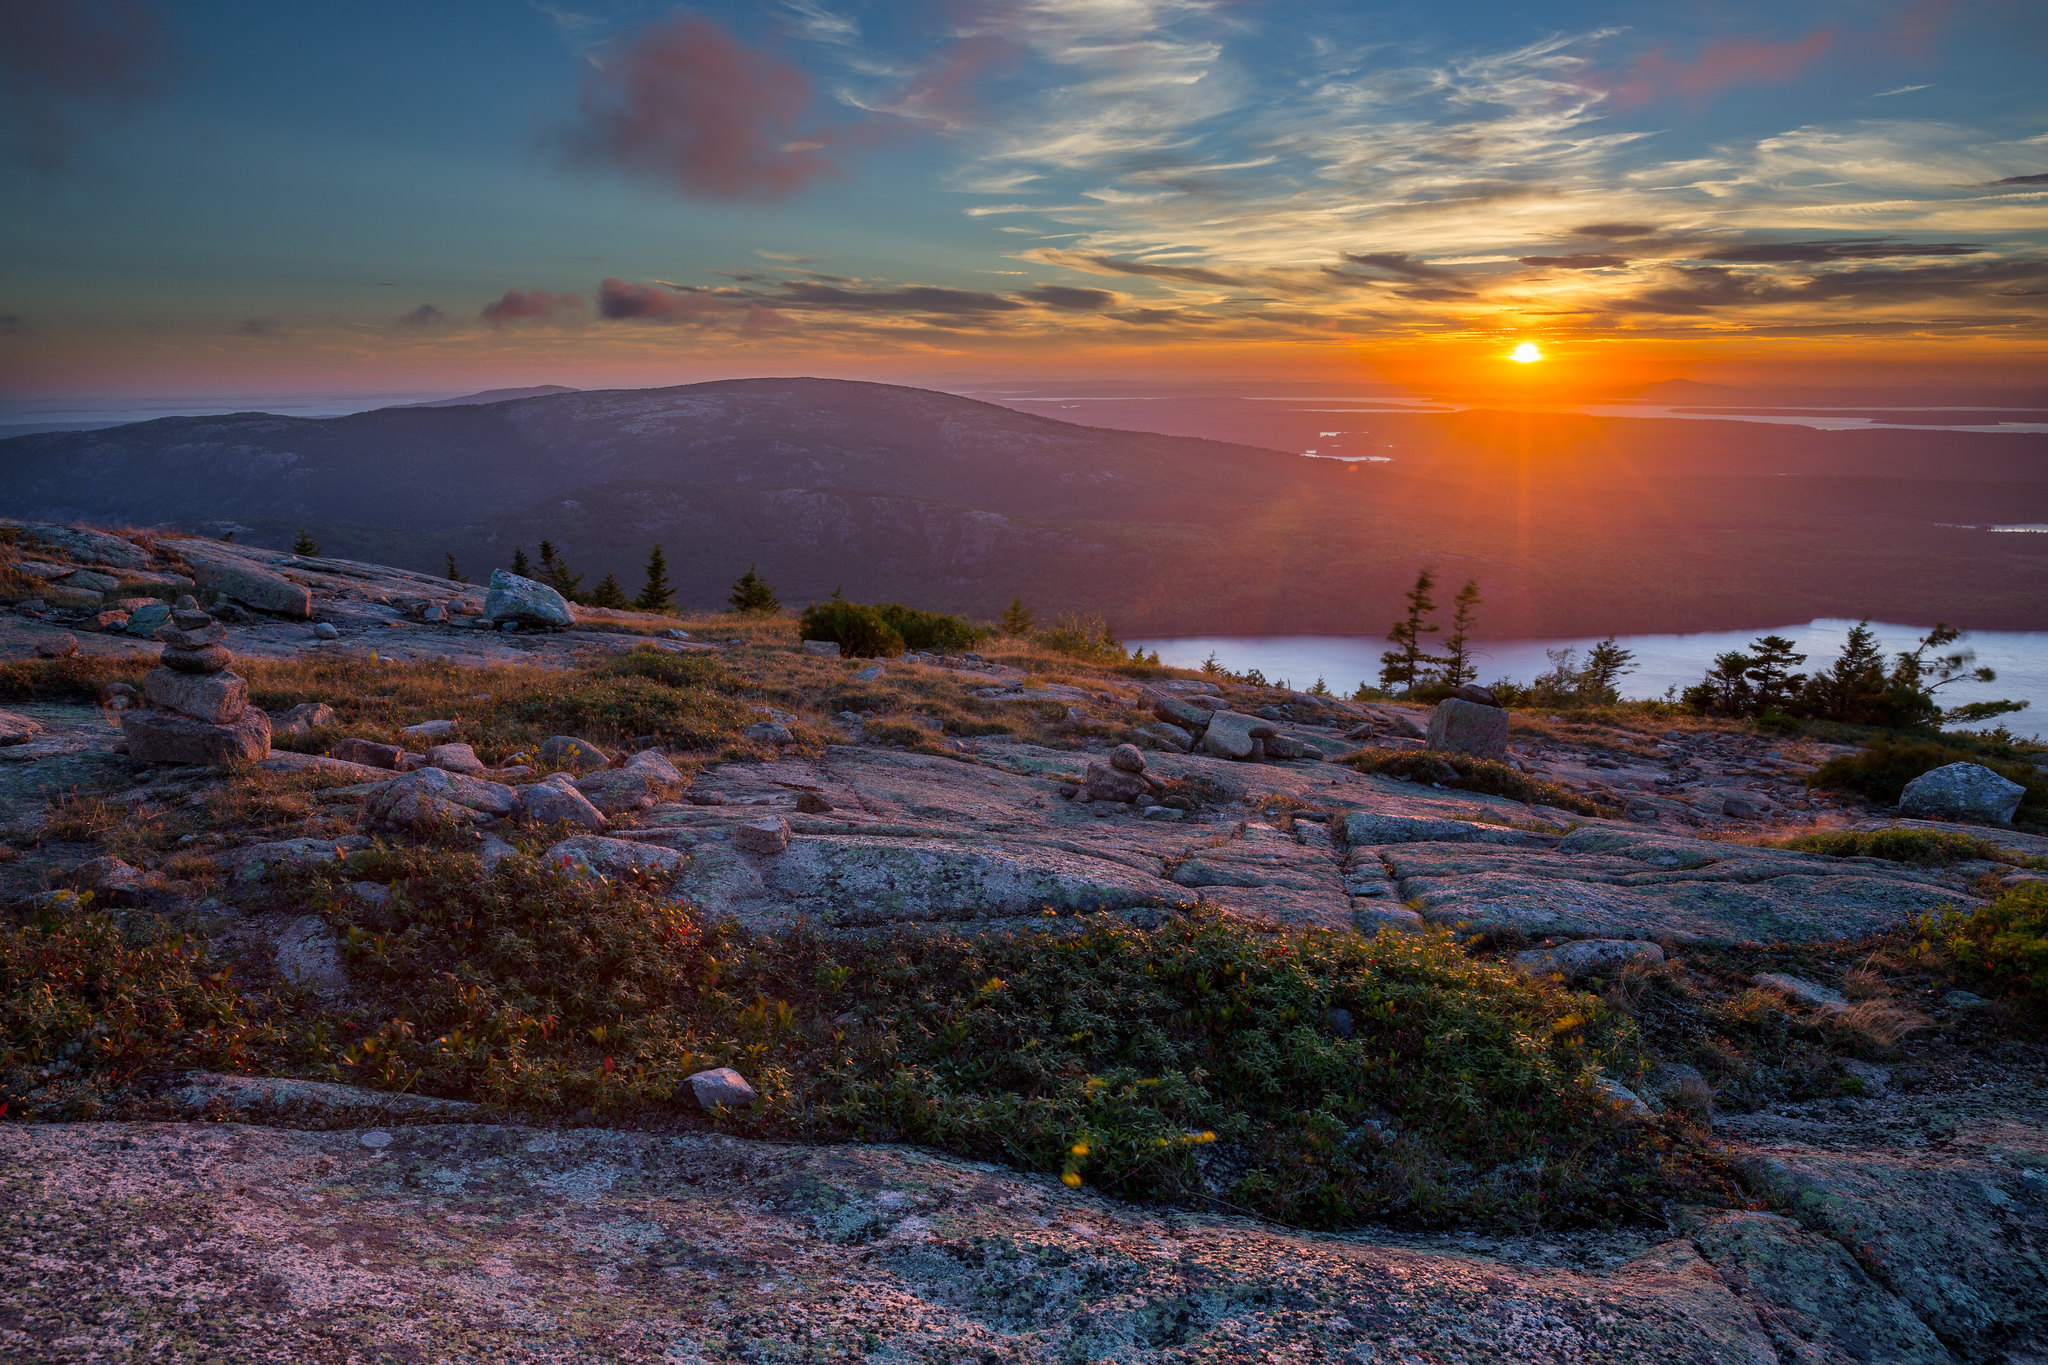 Sunset at Cadillac Mountain, Acadia National Park - Maine, USA [OC